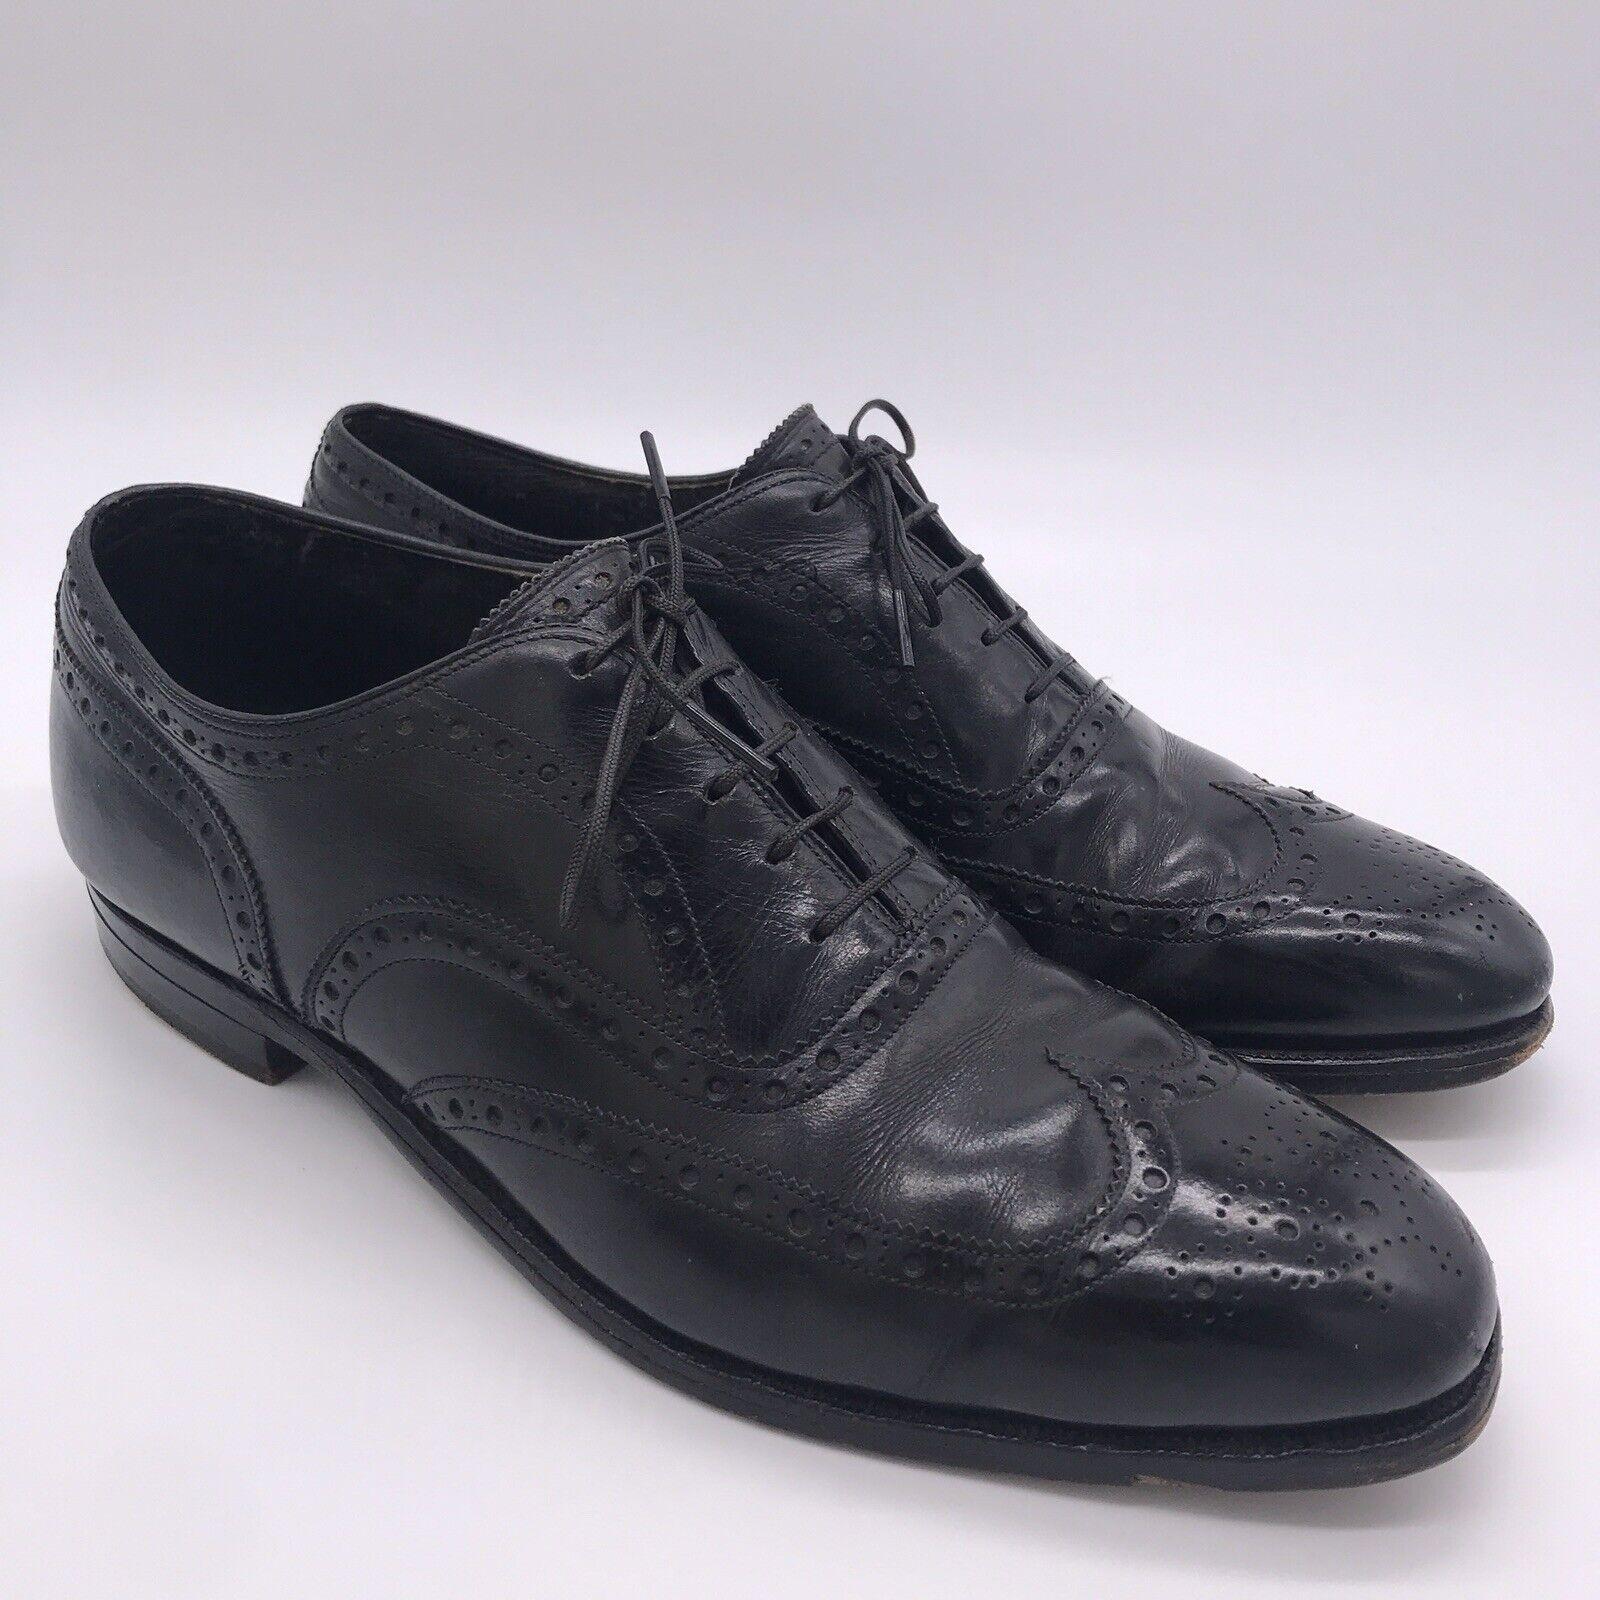 Vintage Johnston & Murphy Size 9 Black Leather Wingtip Brogue Oxford Dress Shoes